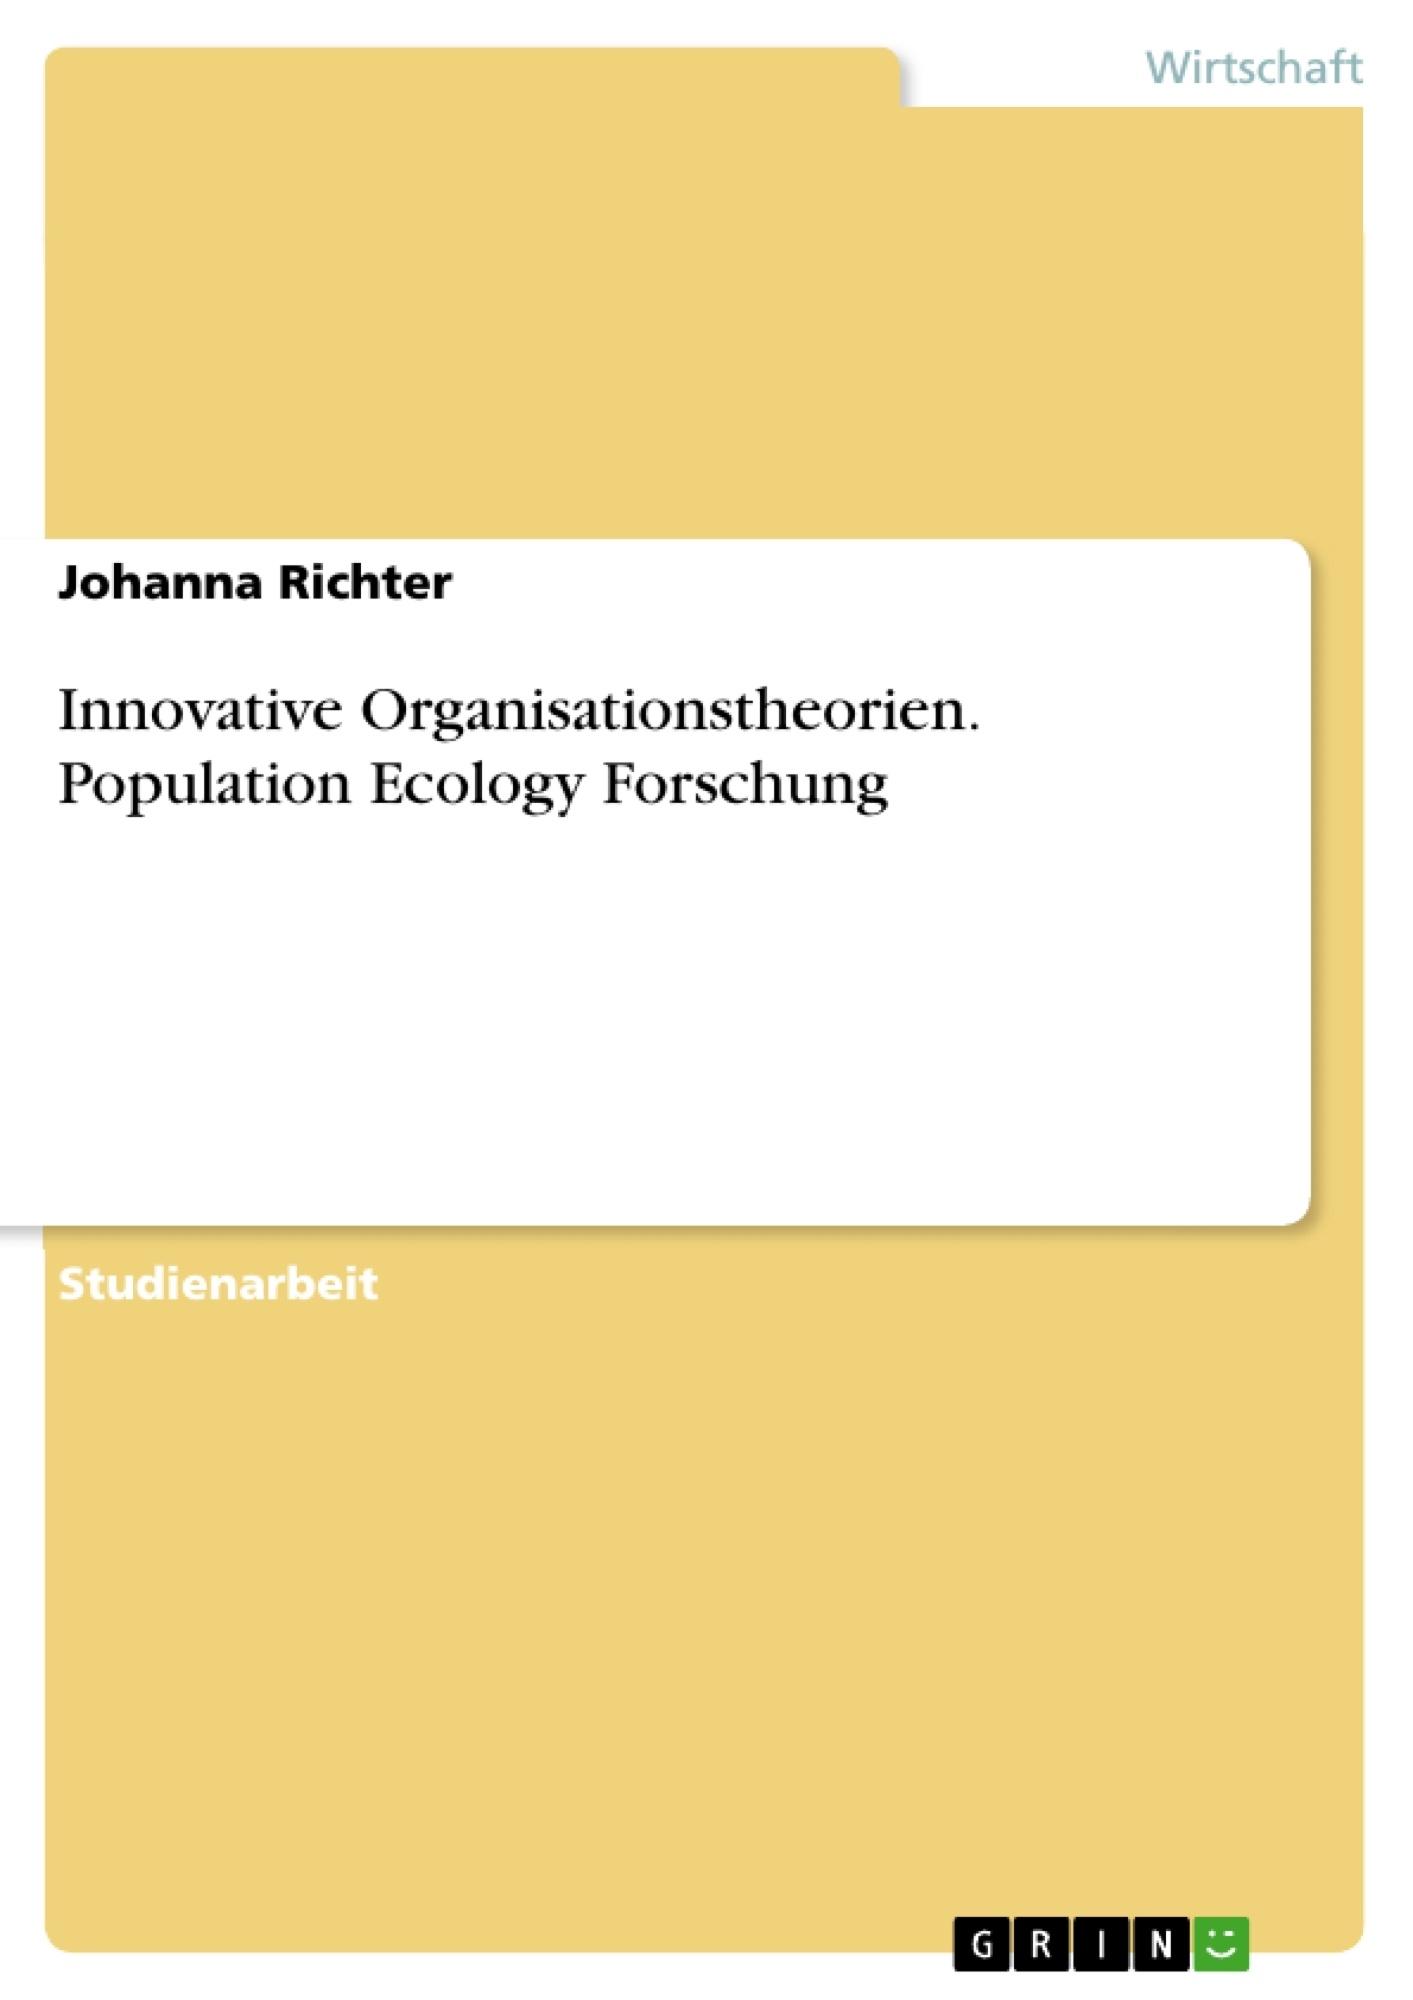 Titel: Innovative Organisationstheorien. Population Ecology Forschung